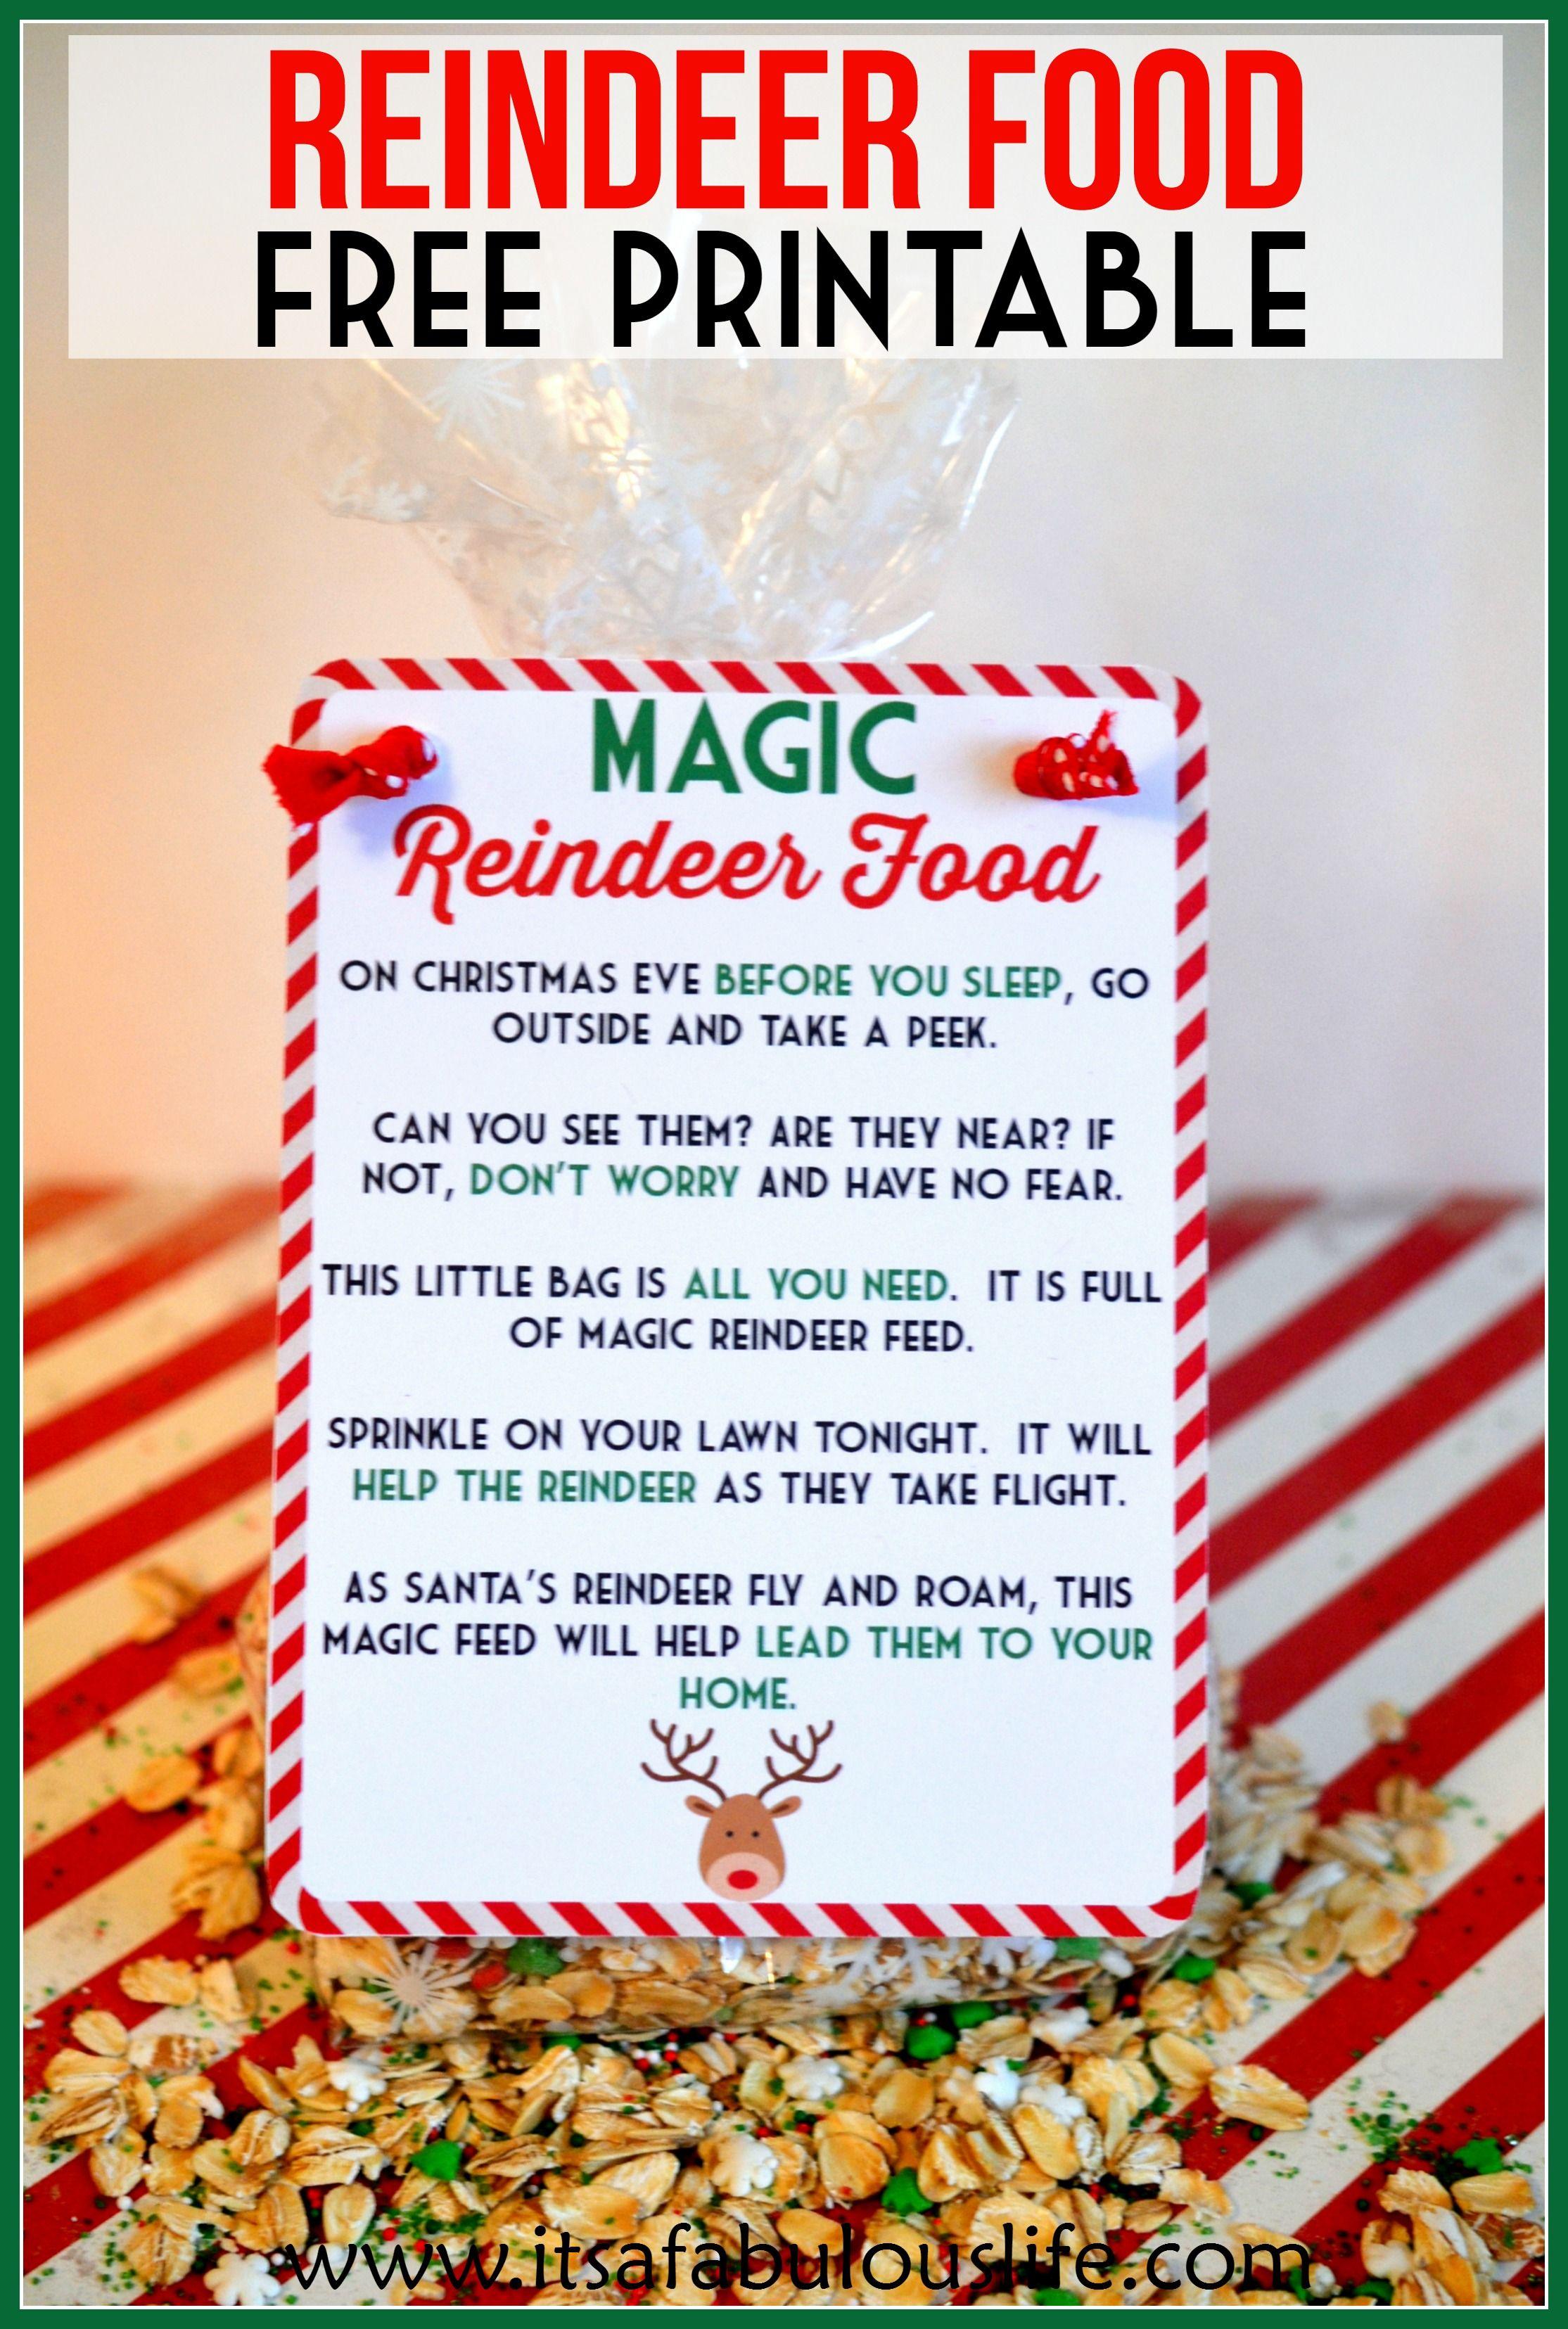 magic reindeer food poem u0026 free printable also includes the